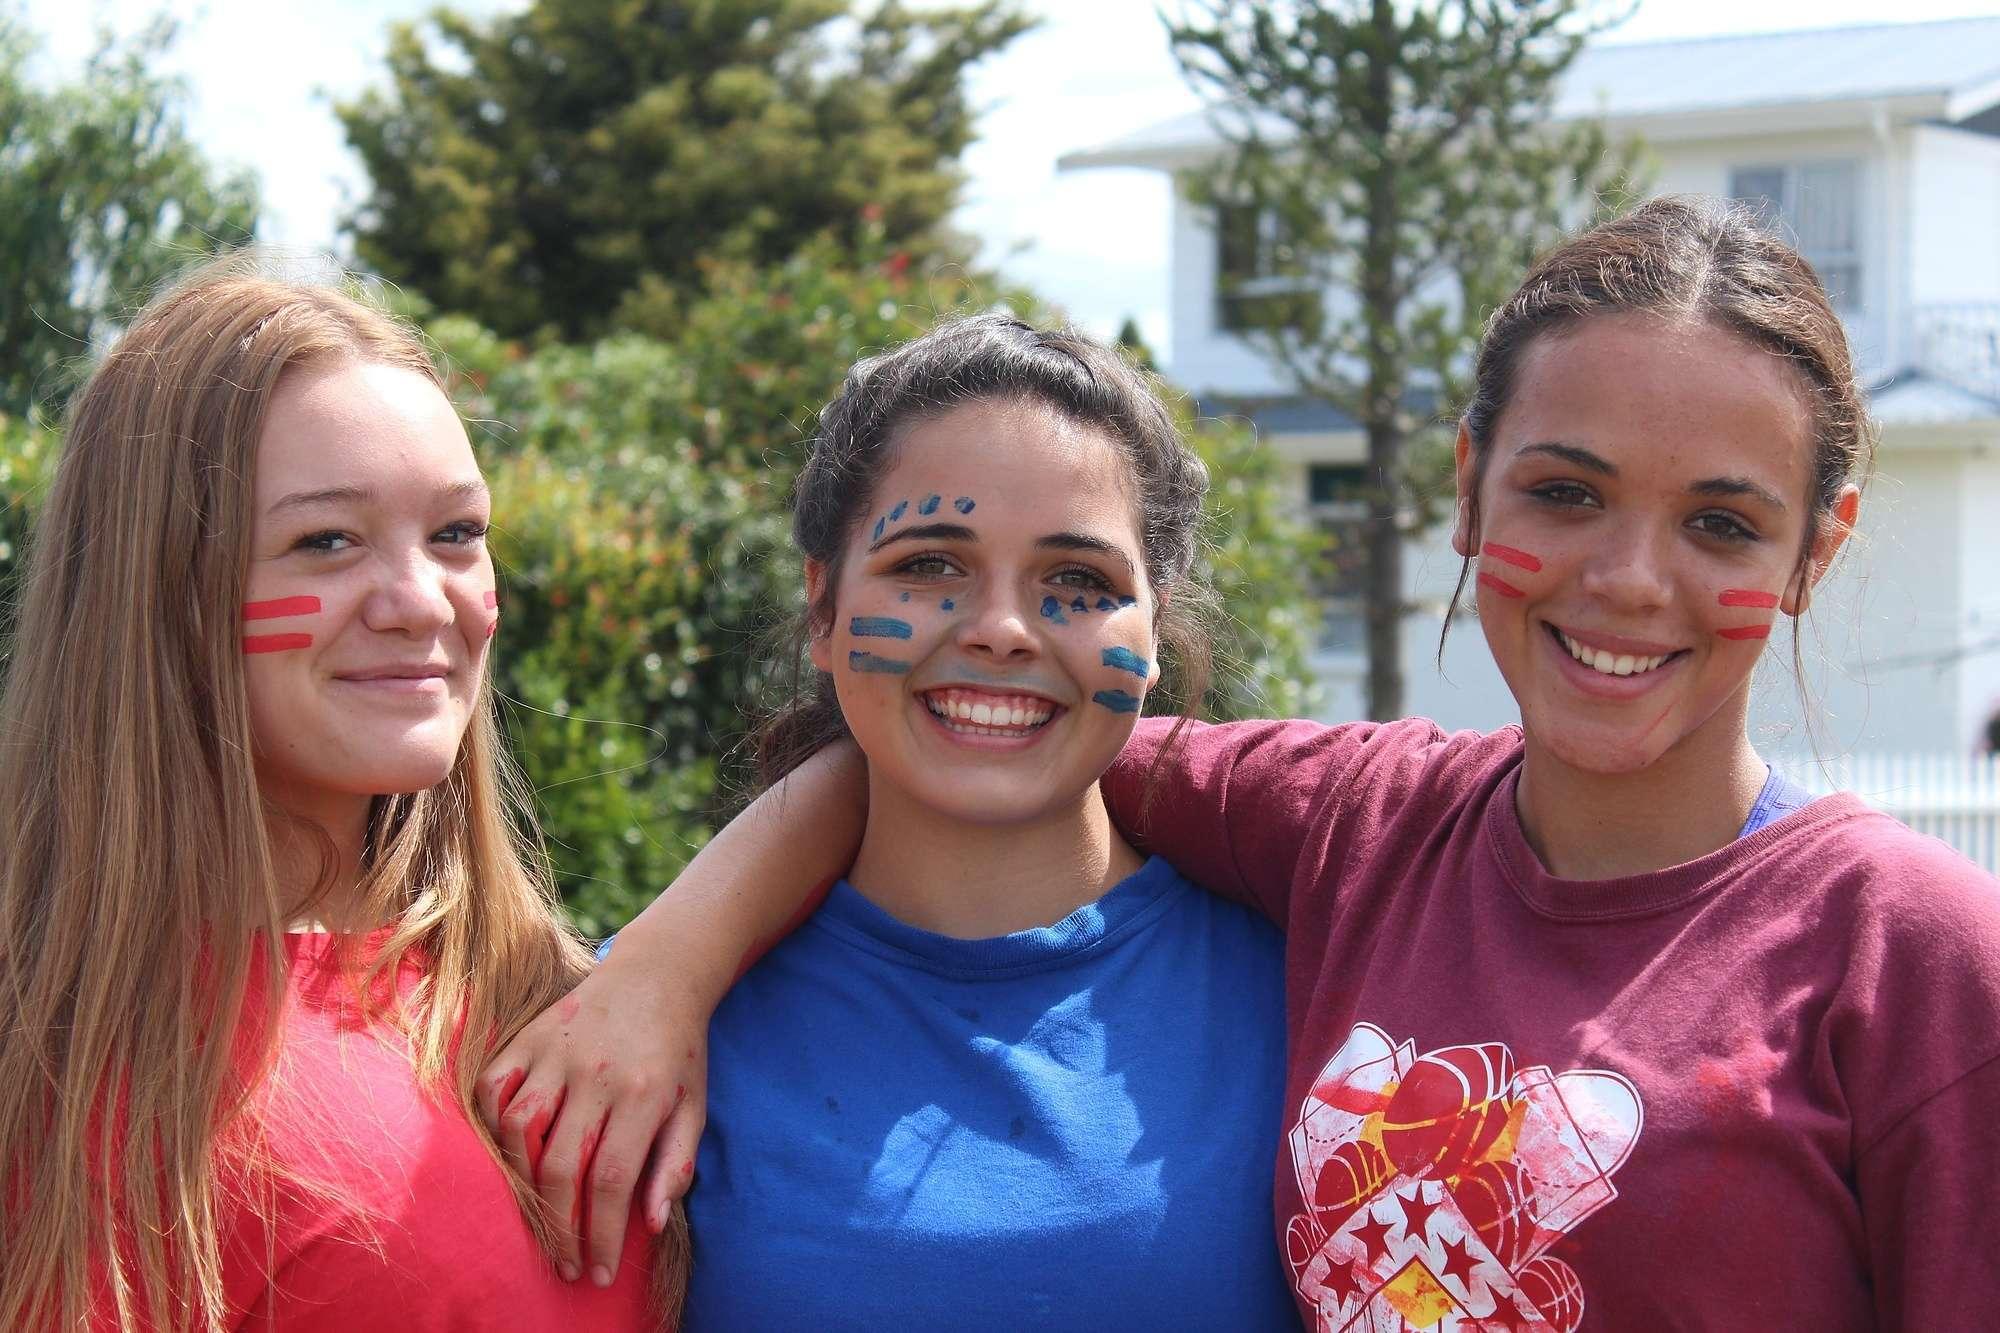 Prospectus • About  •  Te Aroha College